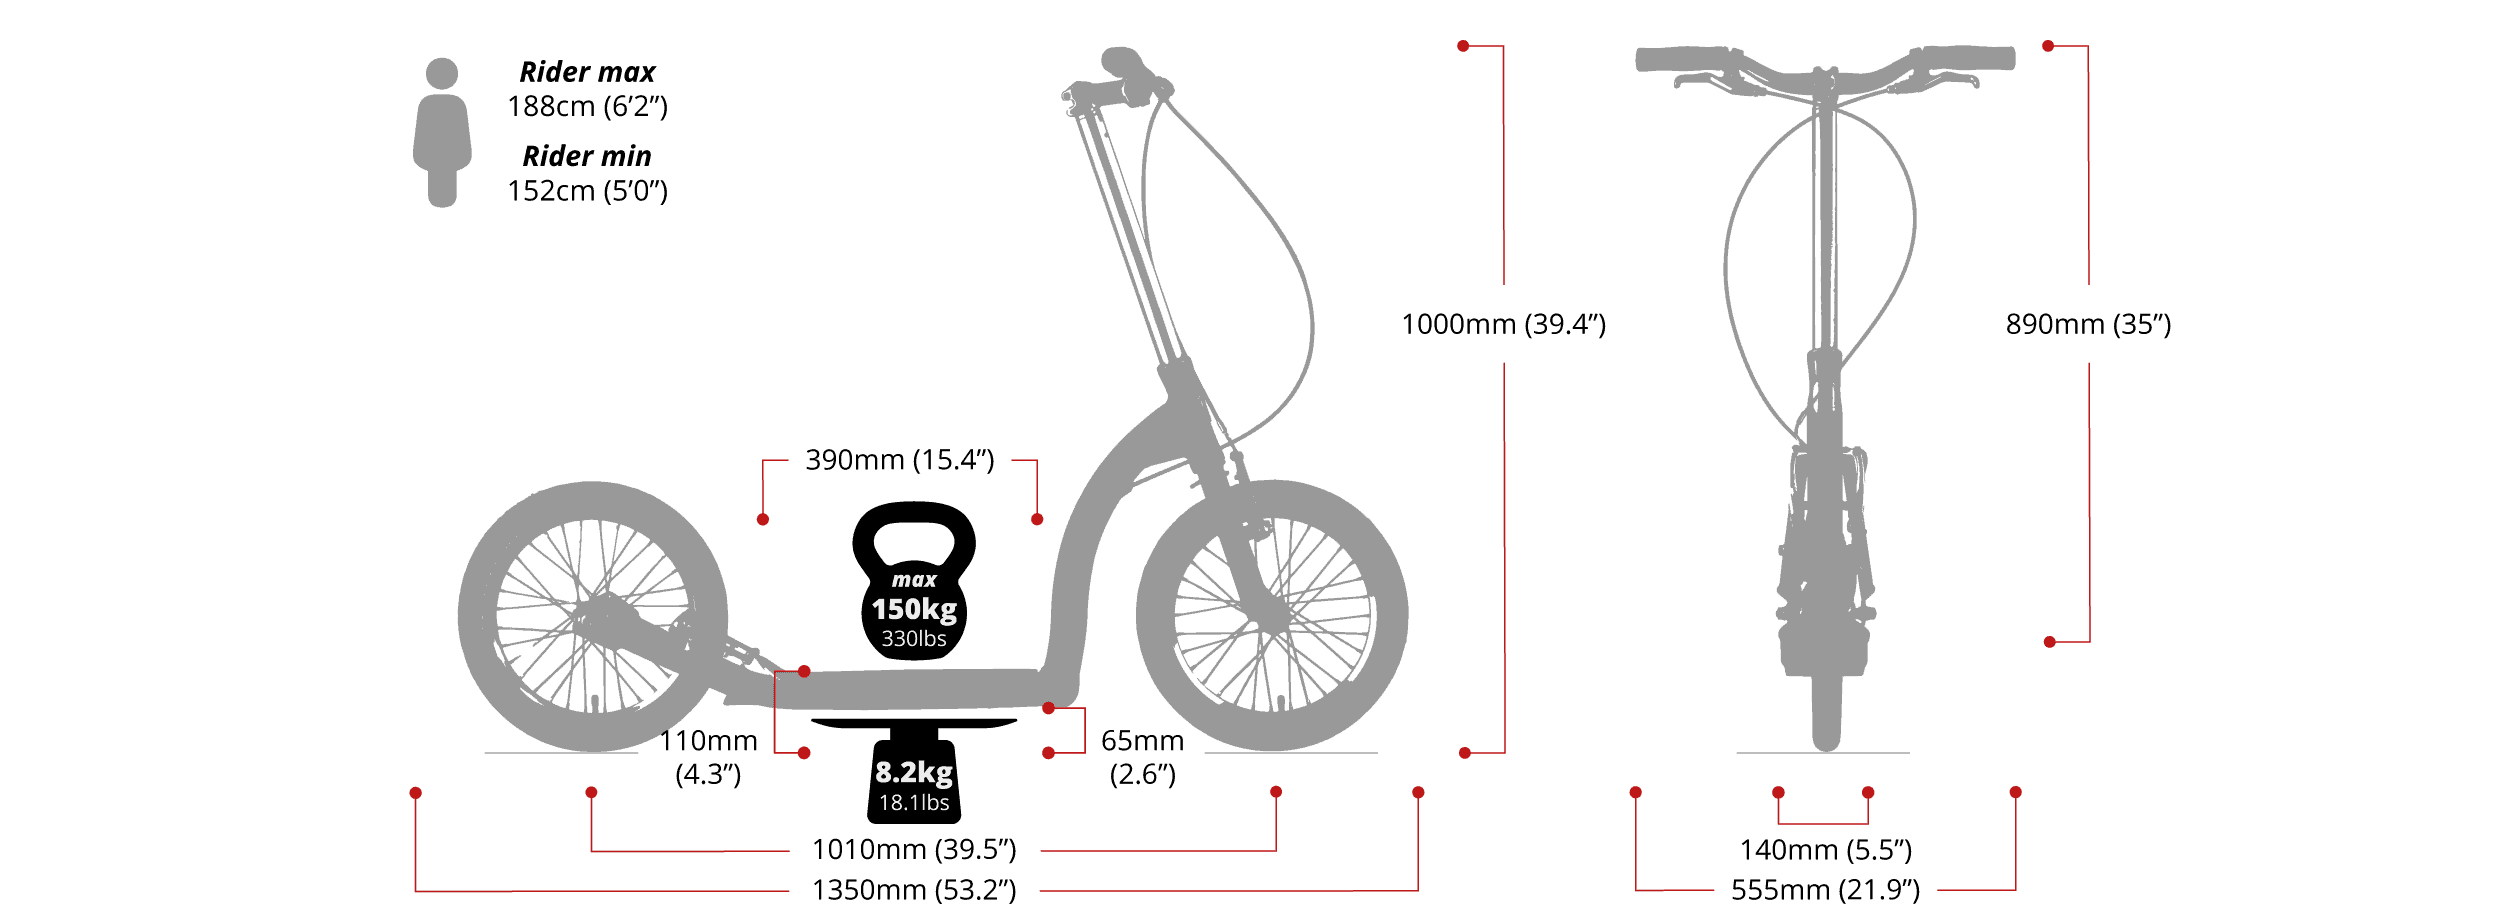 Swifty-Zero-Maße-Größe-Länge